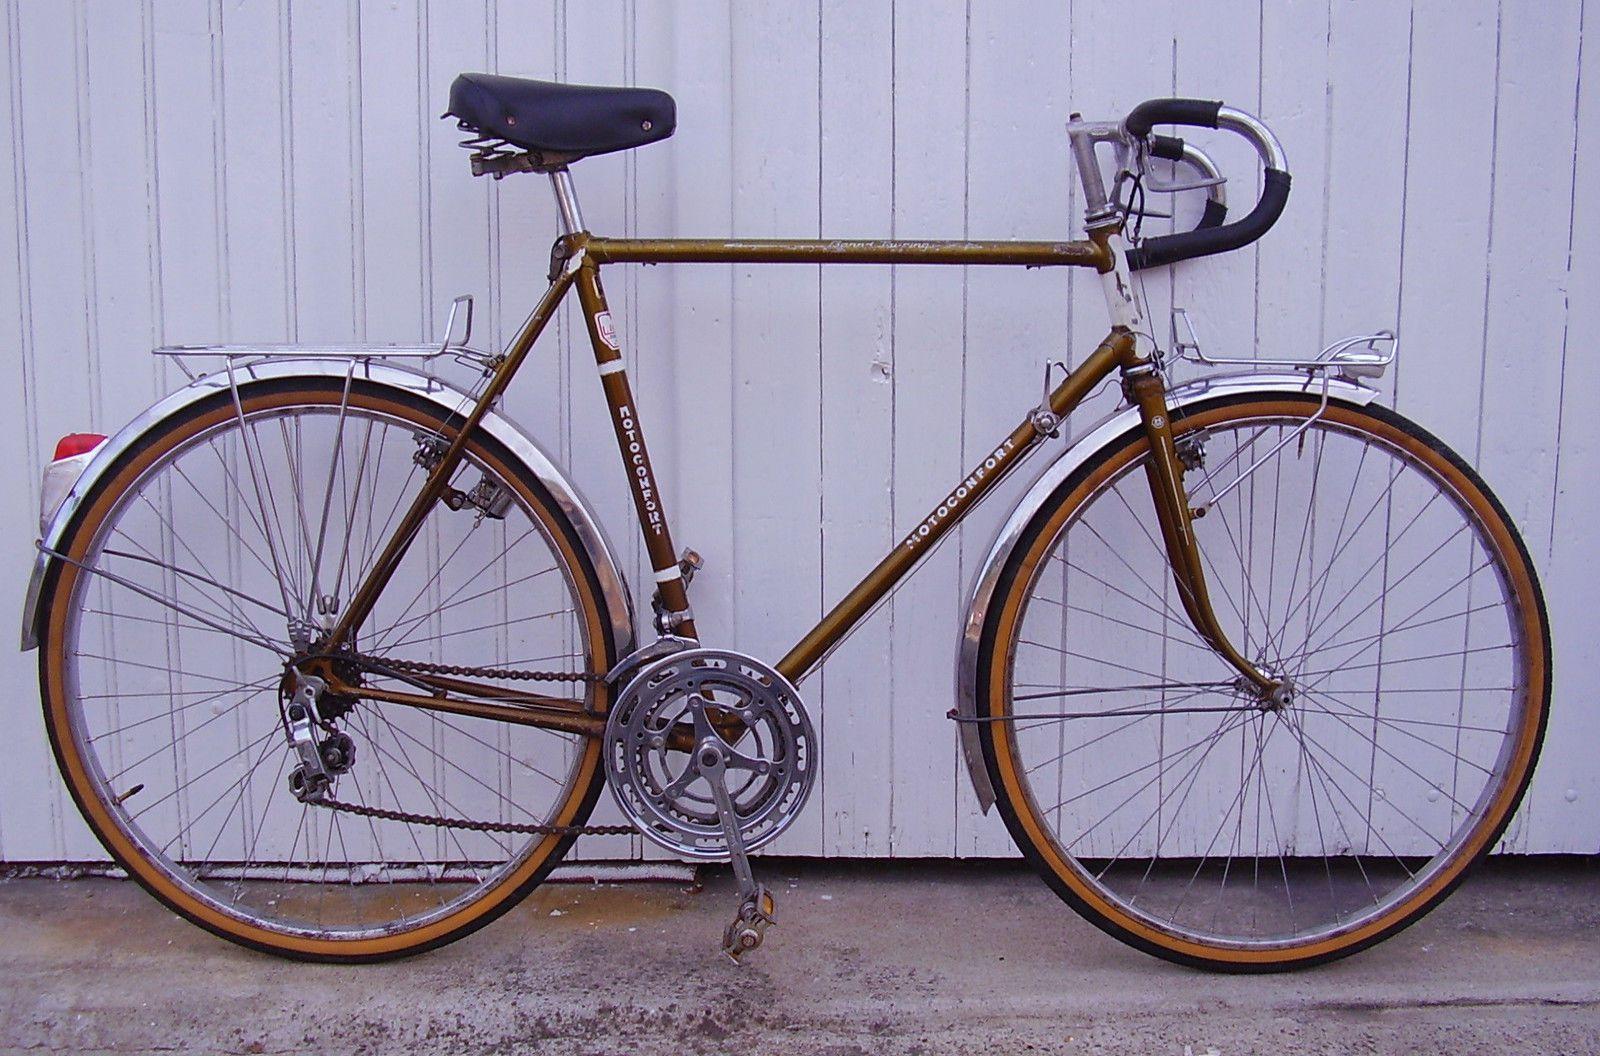 v lo randonneuse motoconfort 650b demi course cyclotouriste randonneur. Black Bedroom Furniture Sets. Home Design Ideas